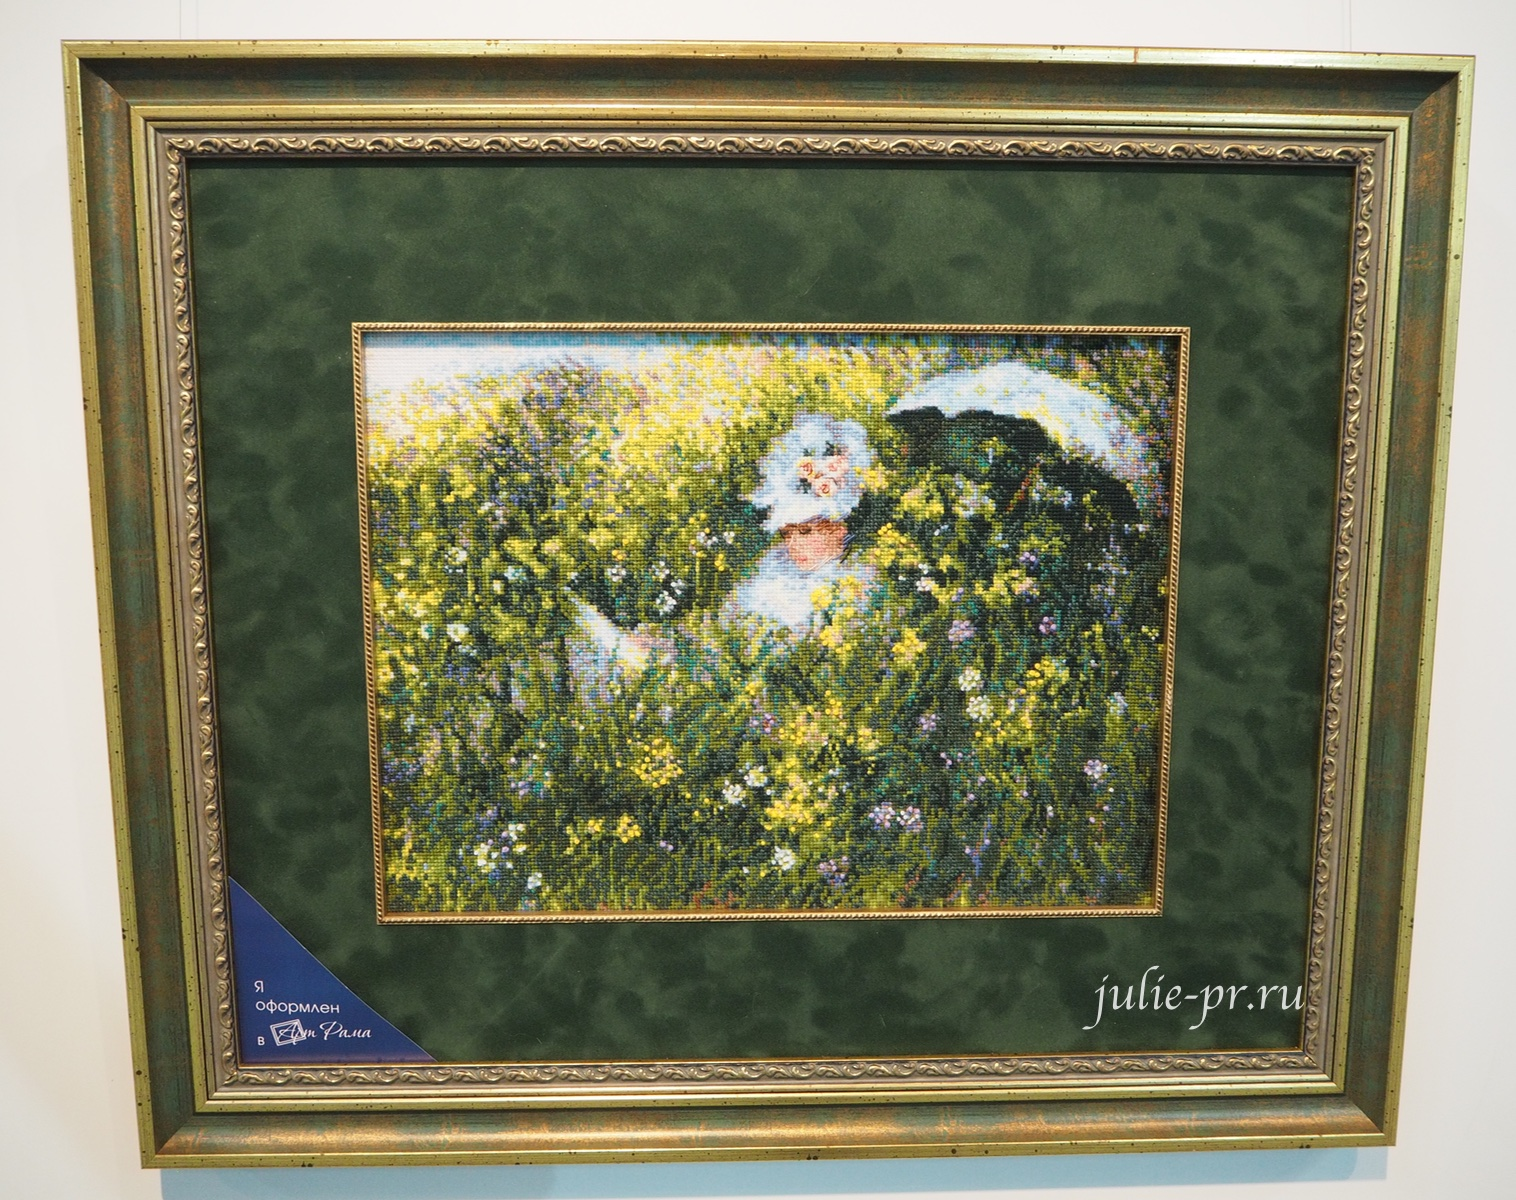 Риолис, вышивка крестом, по картине художника, На лугу, Моне